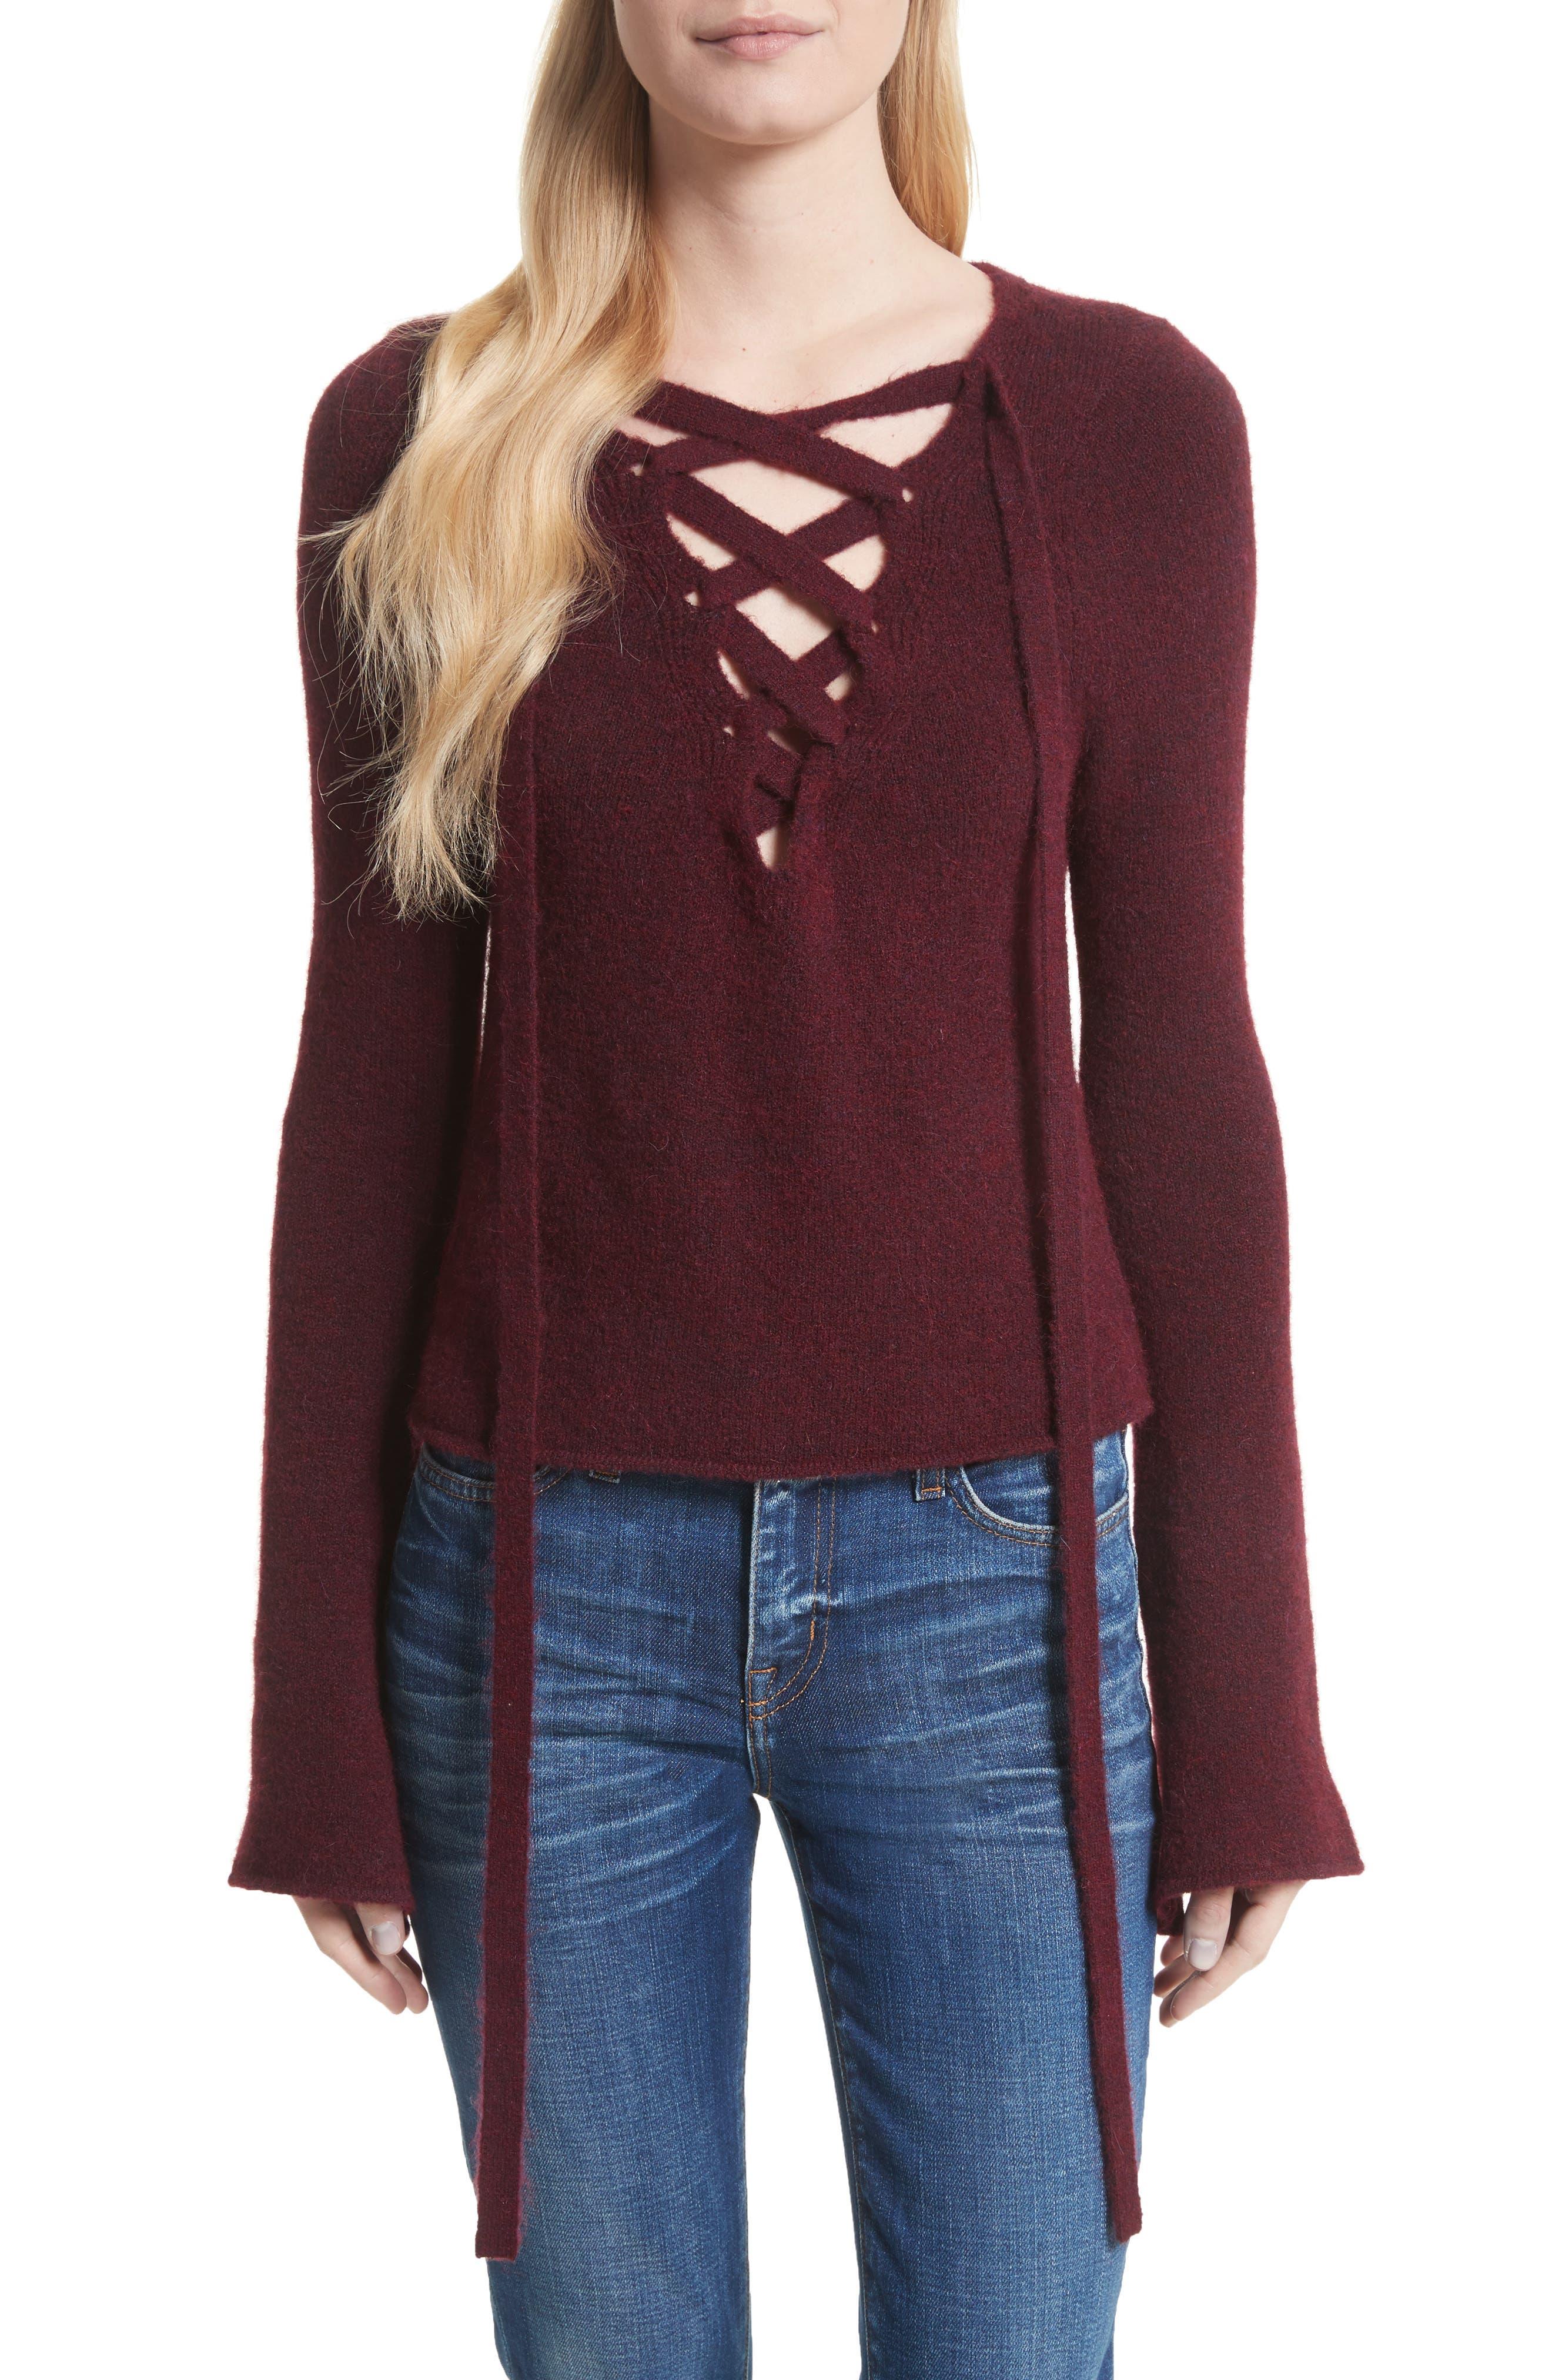 L'AGENCE Candela Lace-Up Sweater